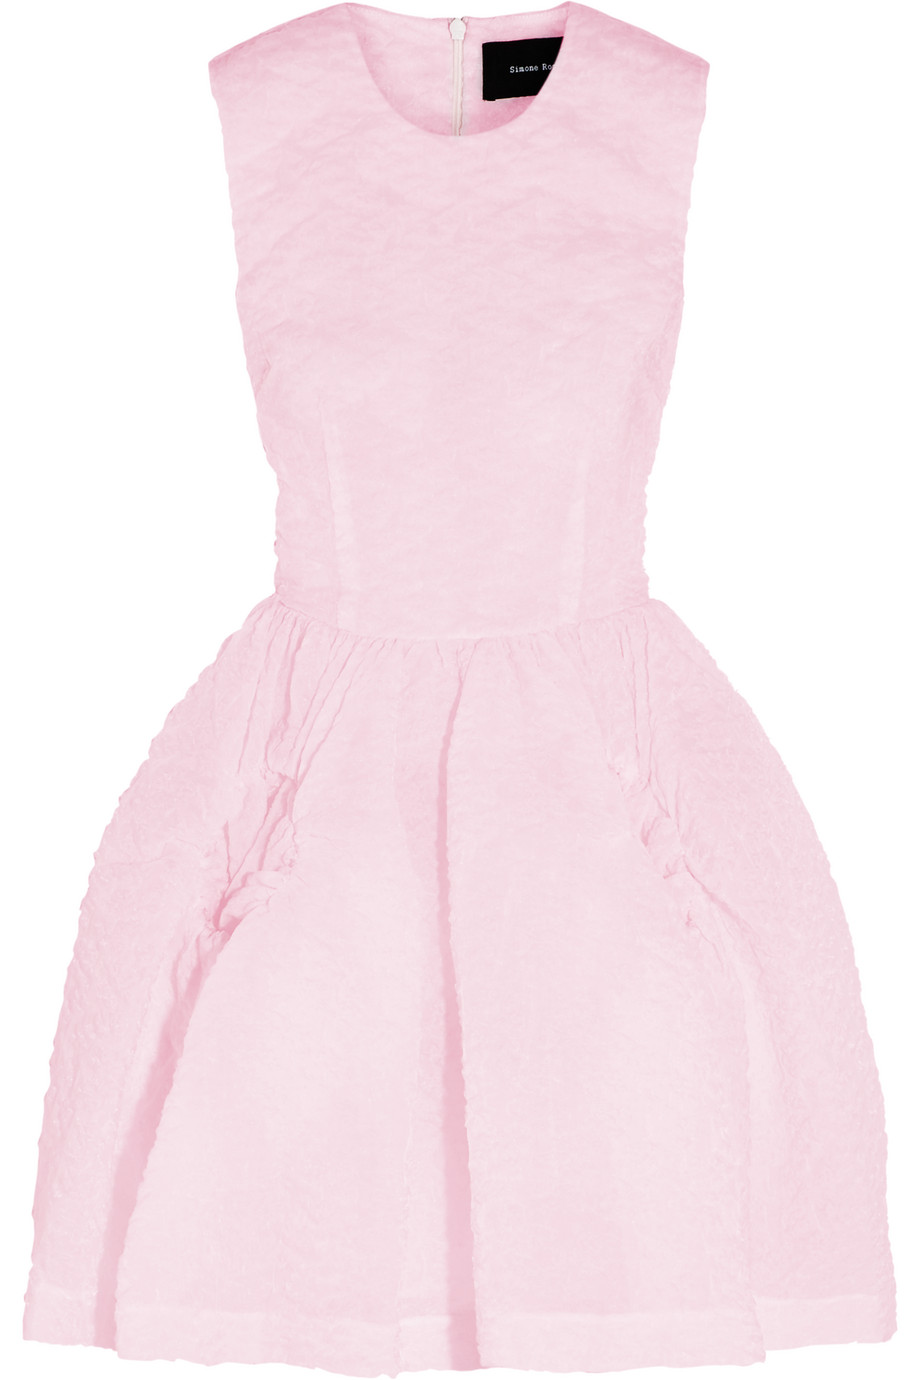 Simone Rocha Cloqué Mini Dress, Pink, Women's, Size: 8